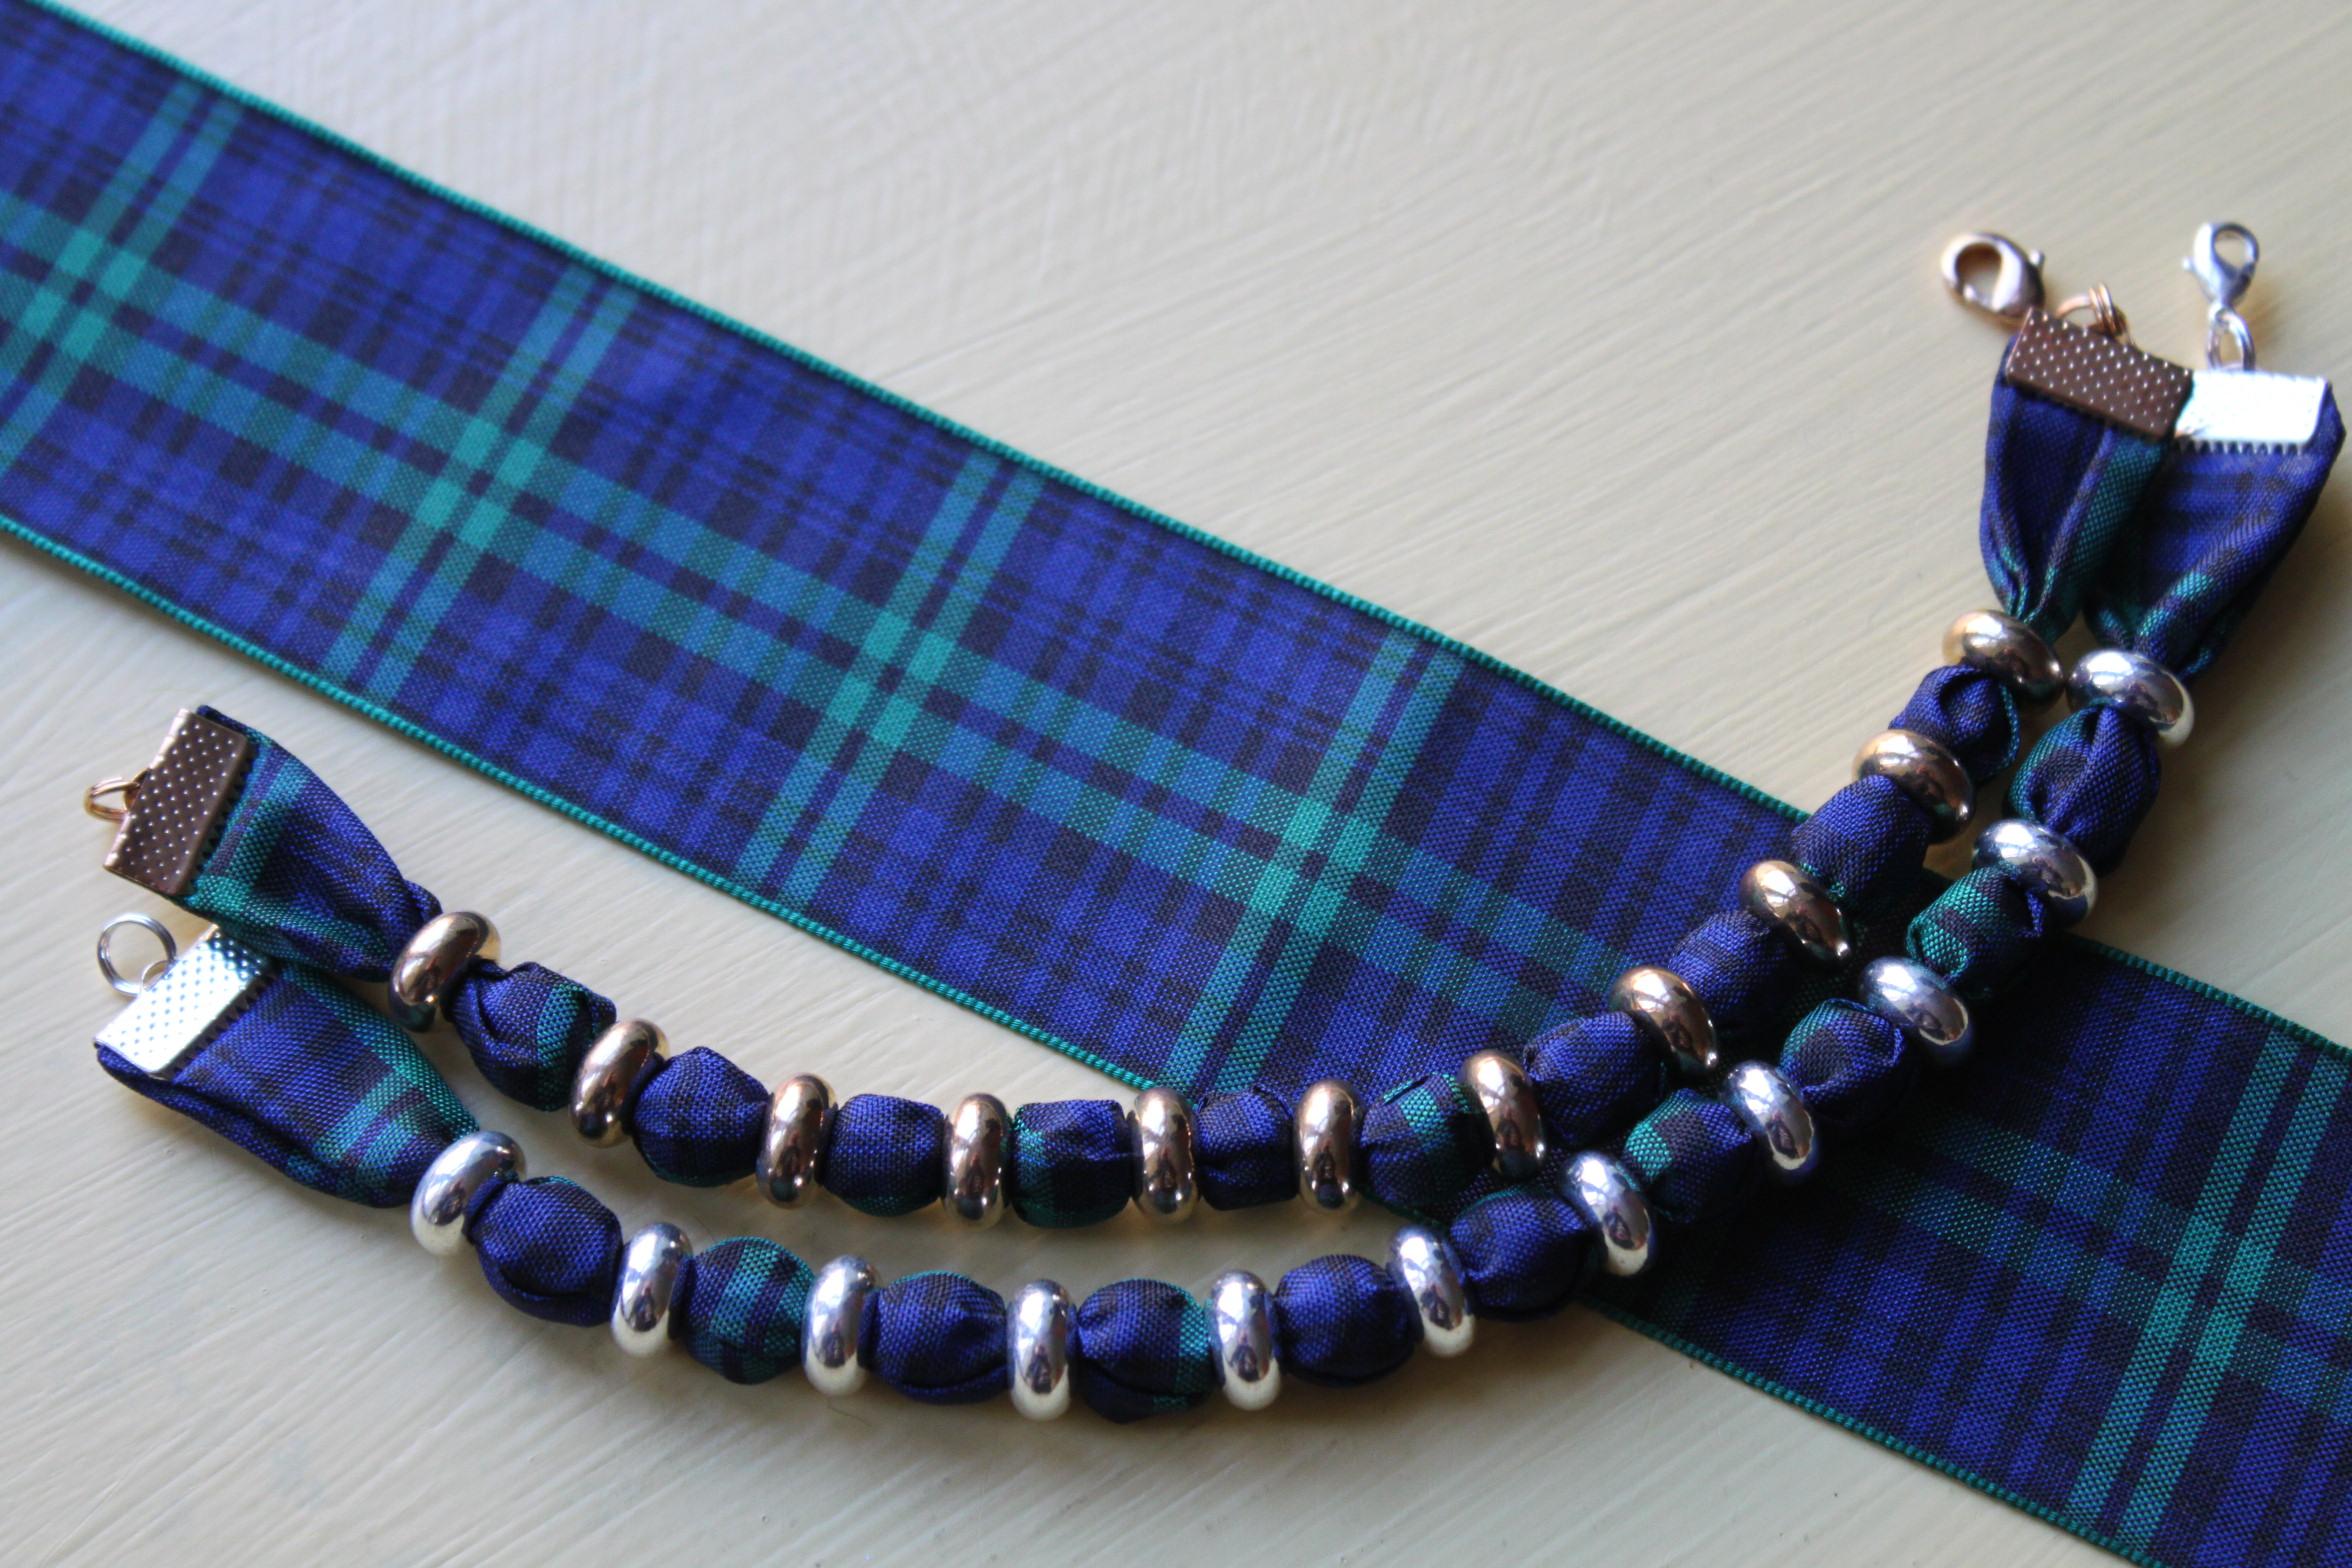 Black Watch Tartan Bracelet Blue, green and black plaid 2